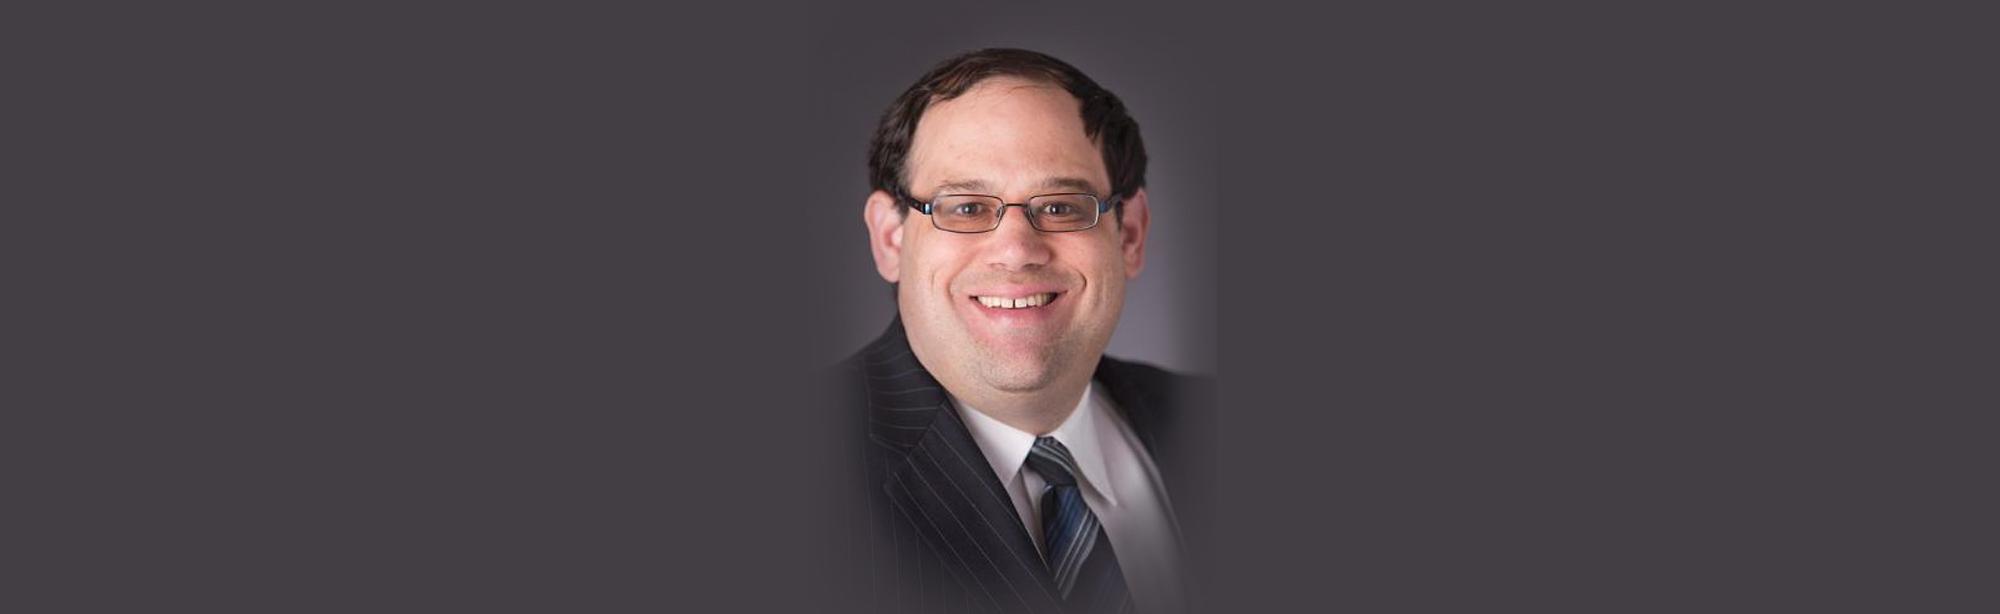 Meet our WiseUsers-Chaim Shapiro